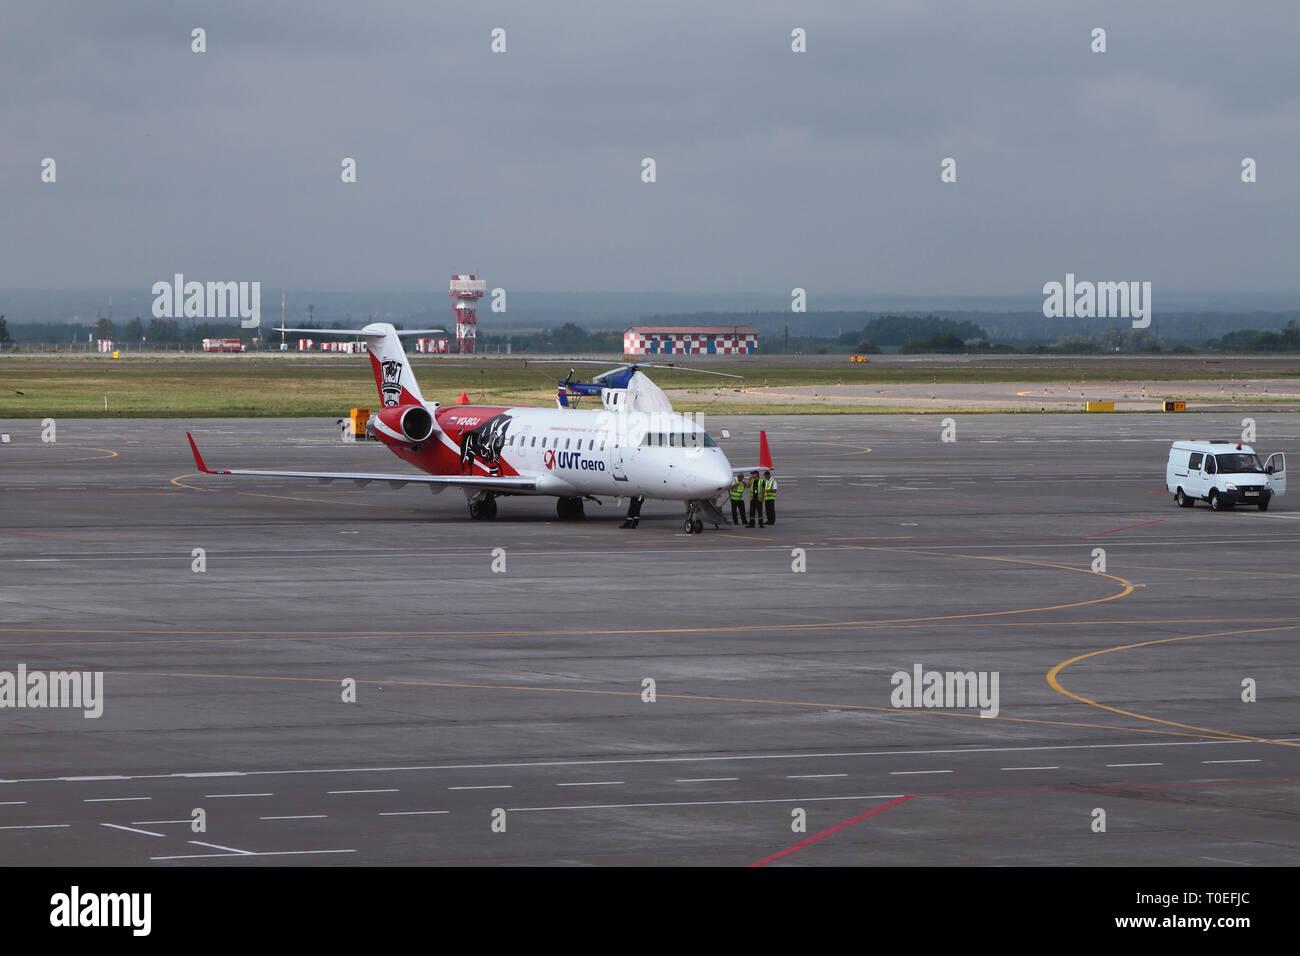 Kazan, Russia - Jul 19, 2018: Maintenance of plane on airfield Stock Photo